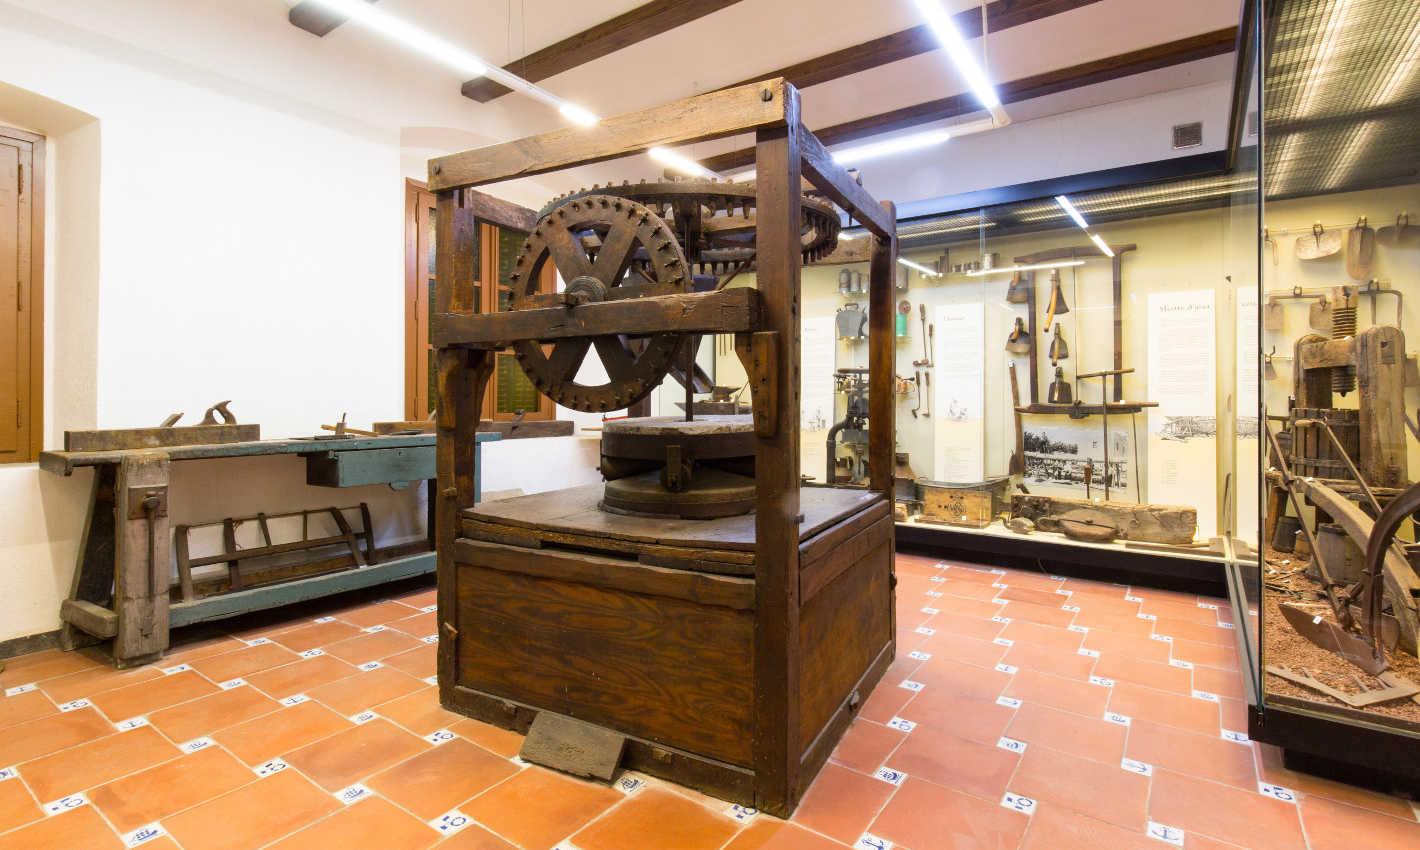 Eines d'oficis tradicionals al Museu-Arxiu de Calella